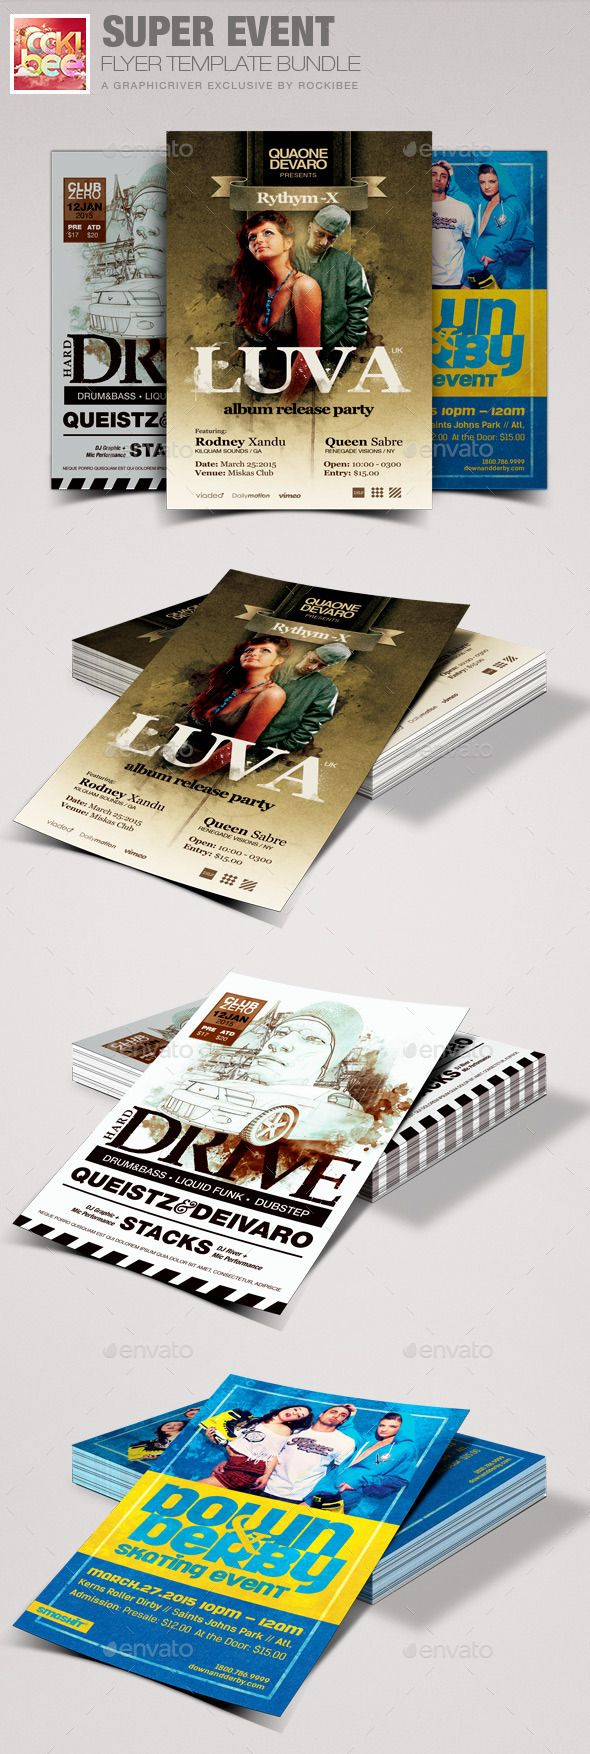 Super Event Flyer Template Bundle | Event flyer templates, Event ...